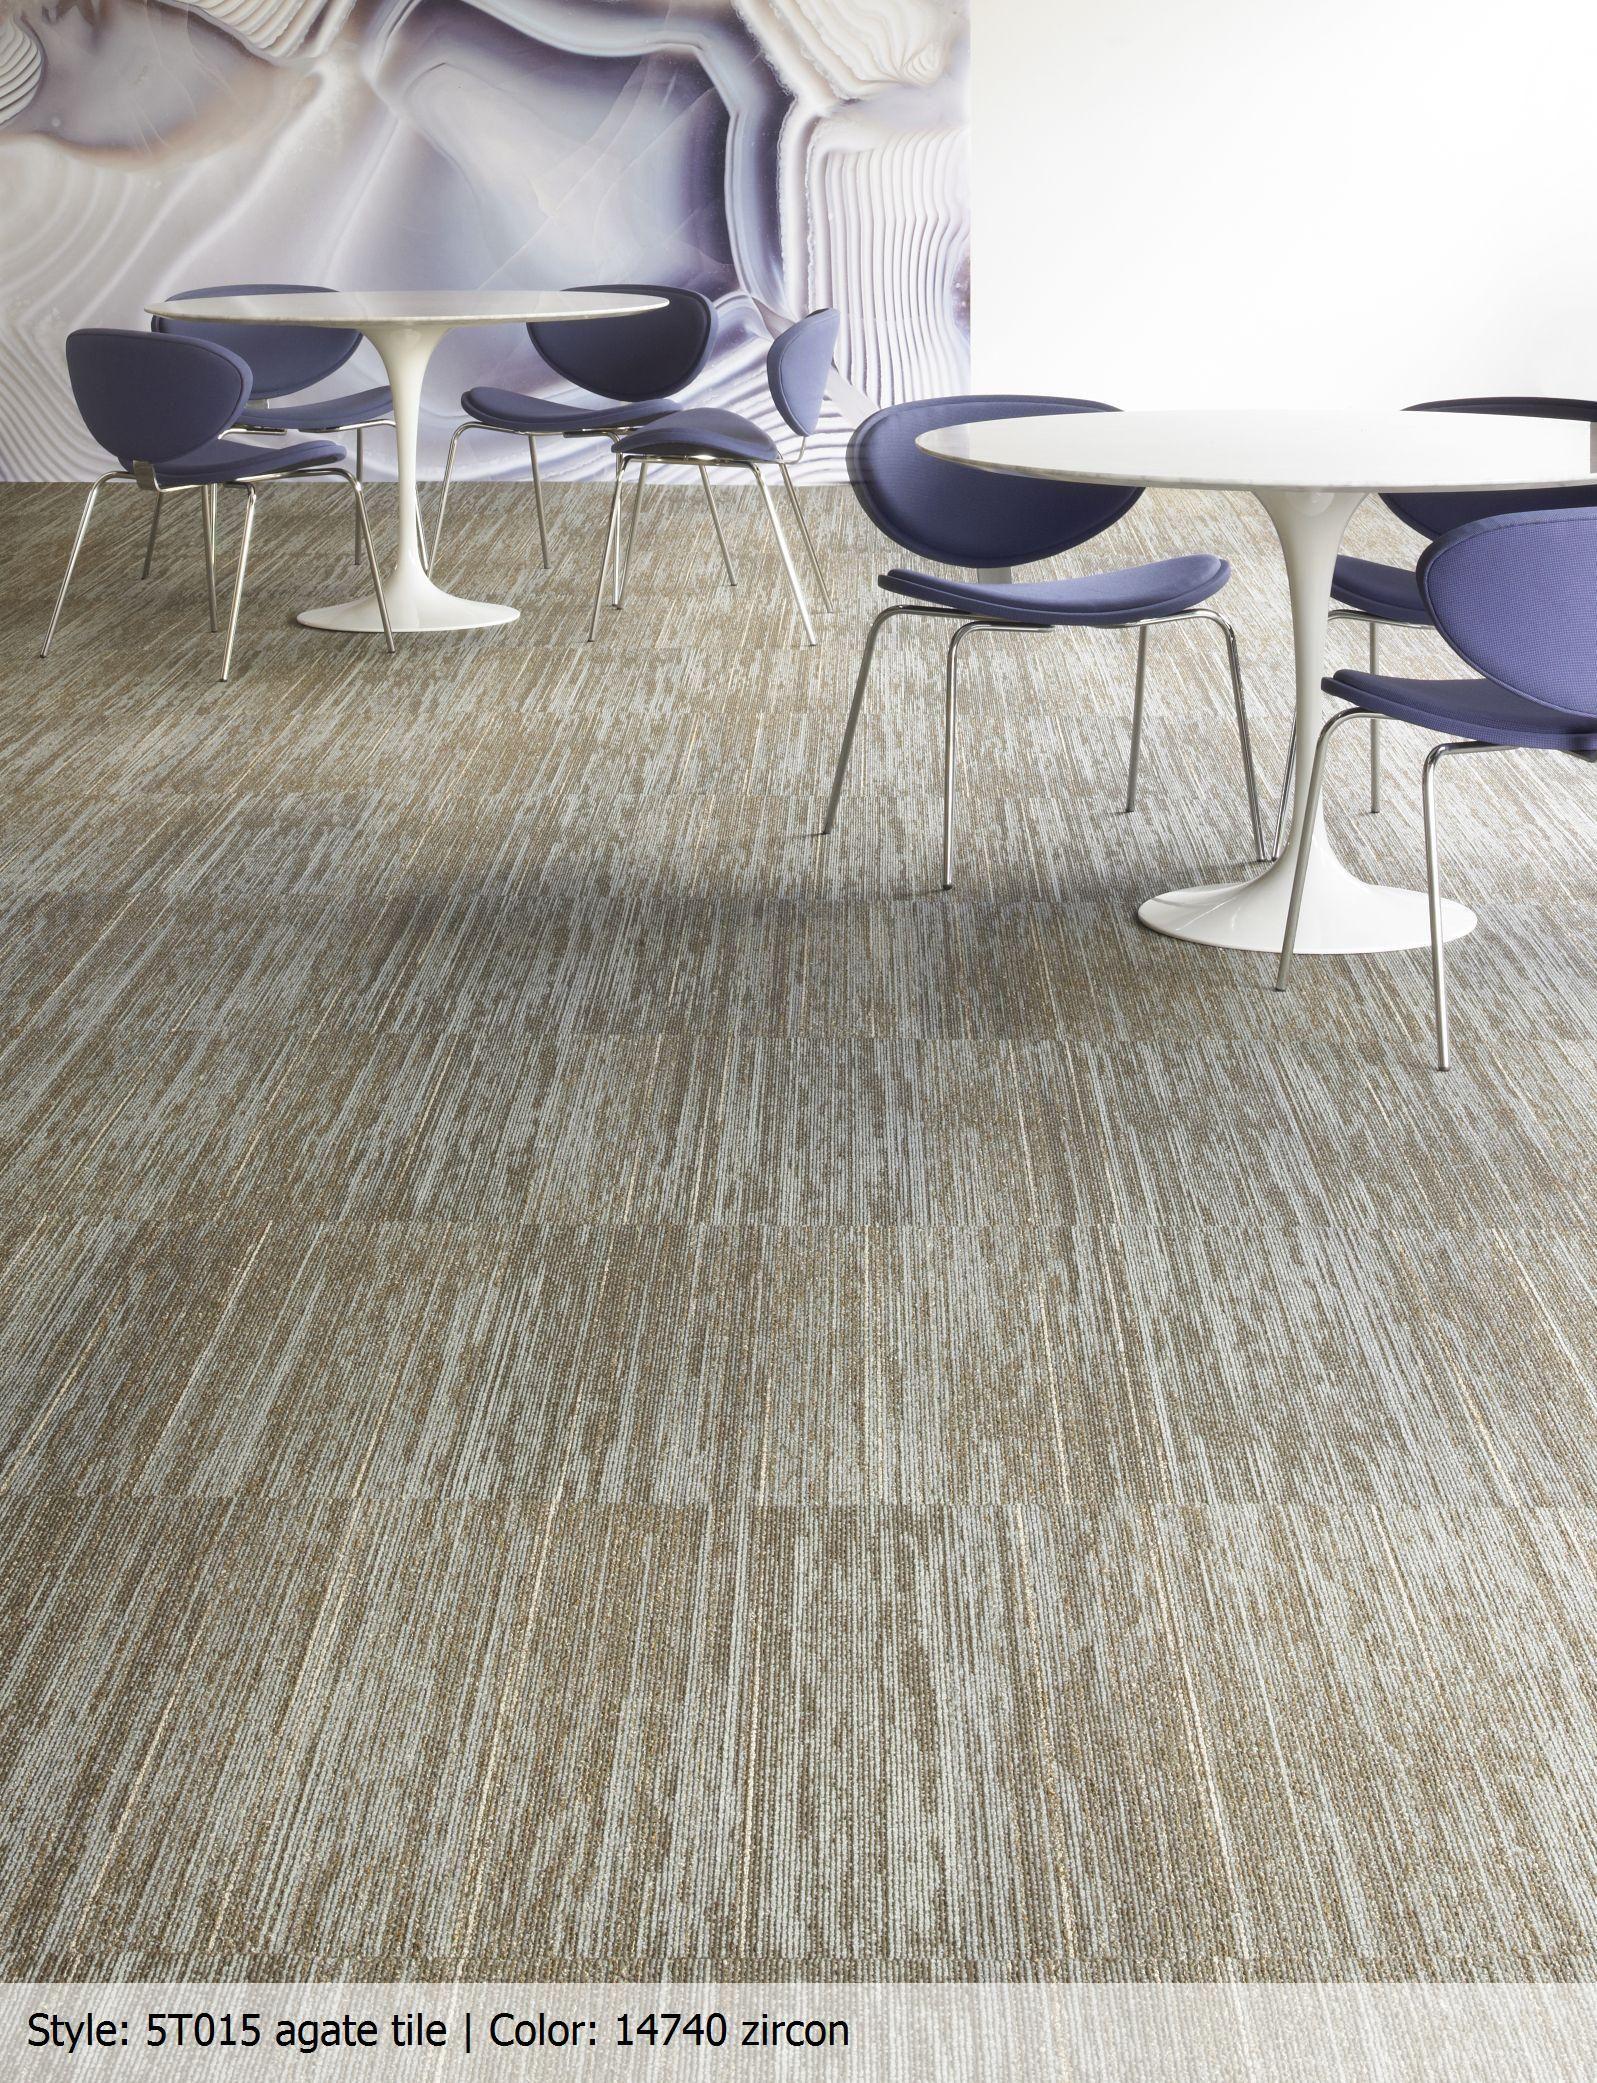 Agate Tile Carpet tiles cheap, Carpet tiles, Cheap carpet